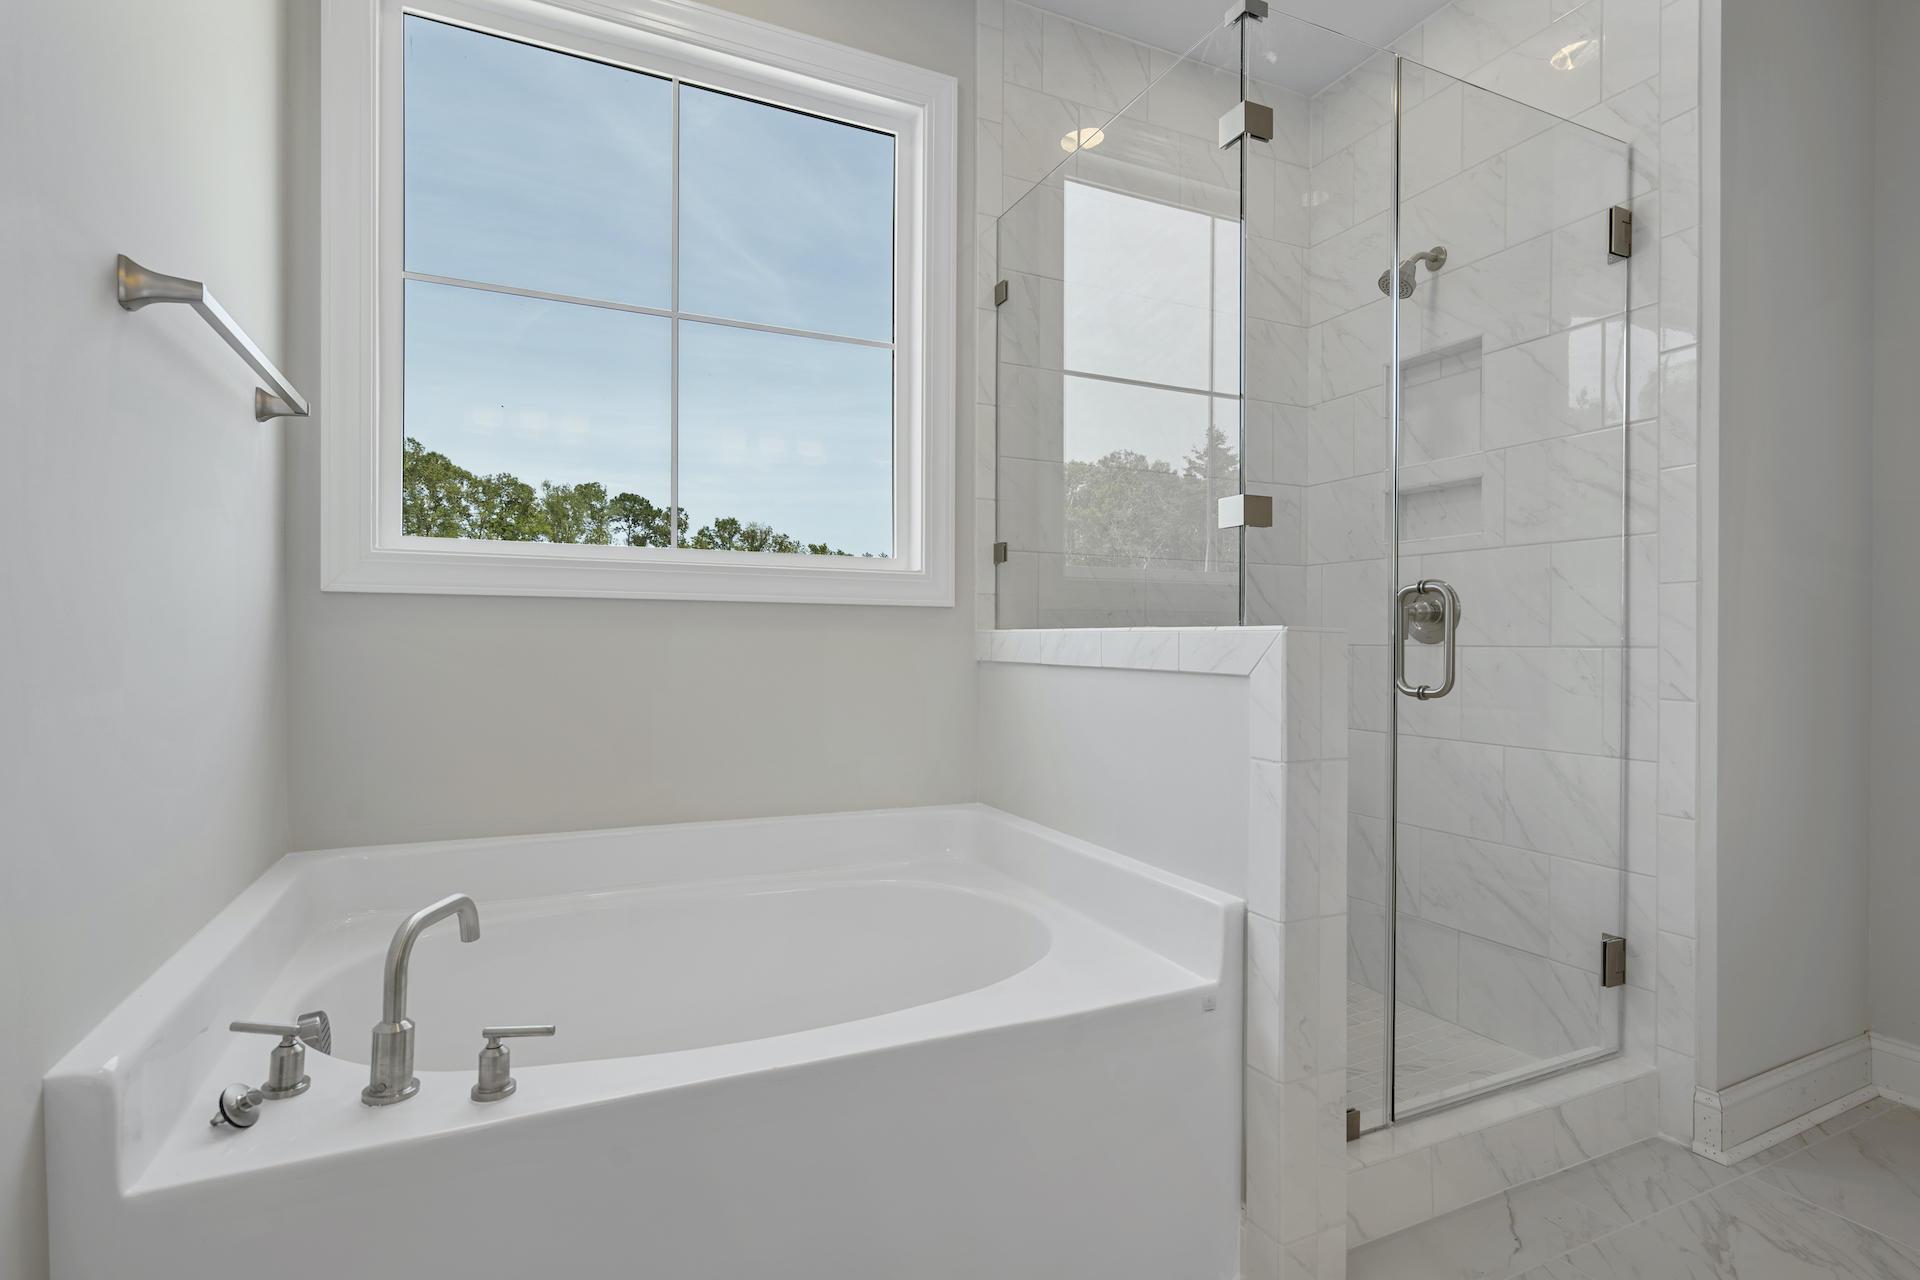 Drayton Oaks Homes For Sale - 105 Plowden Mill, Summerville, SC - 15